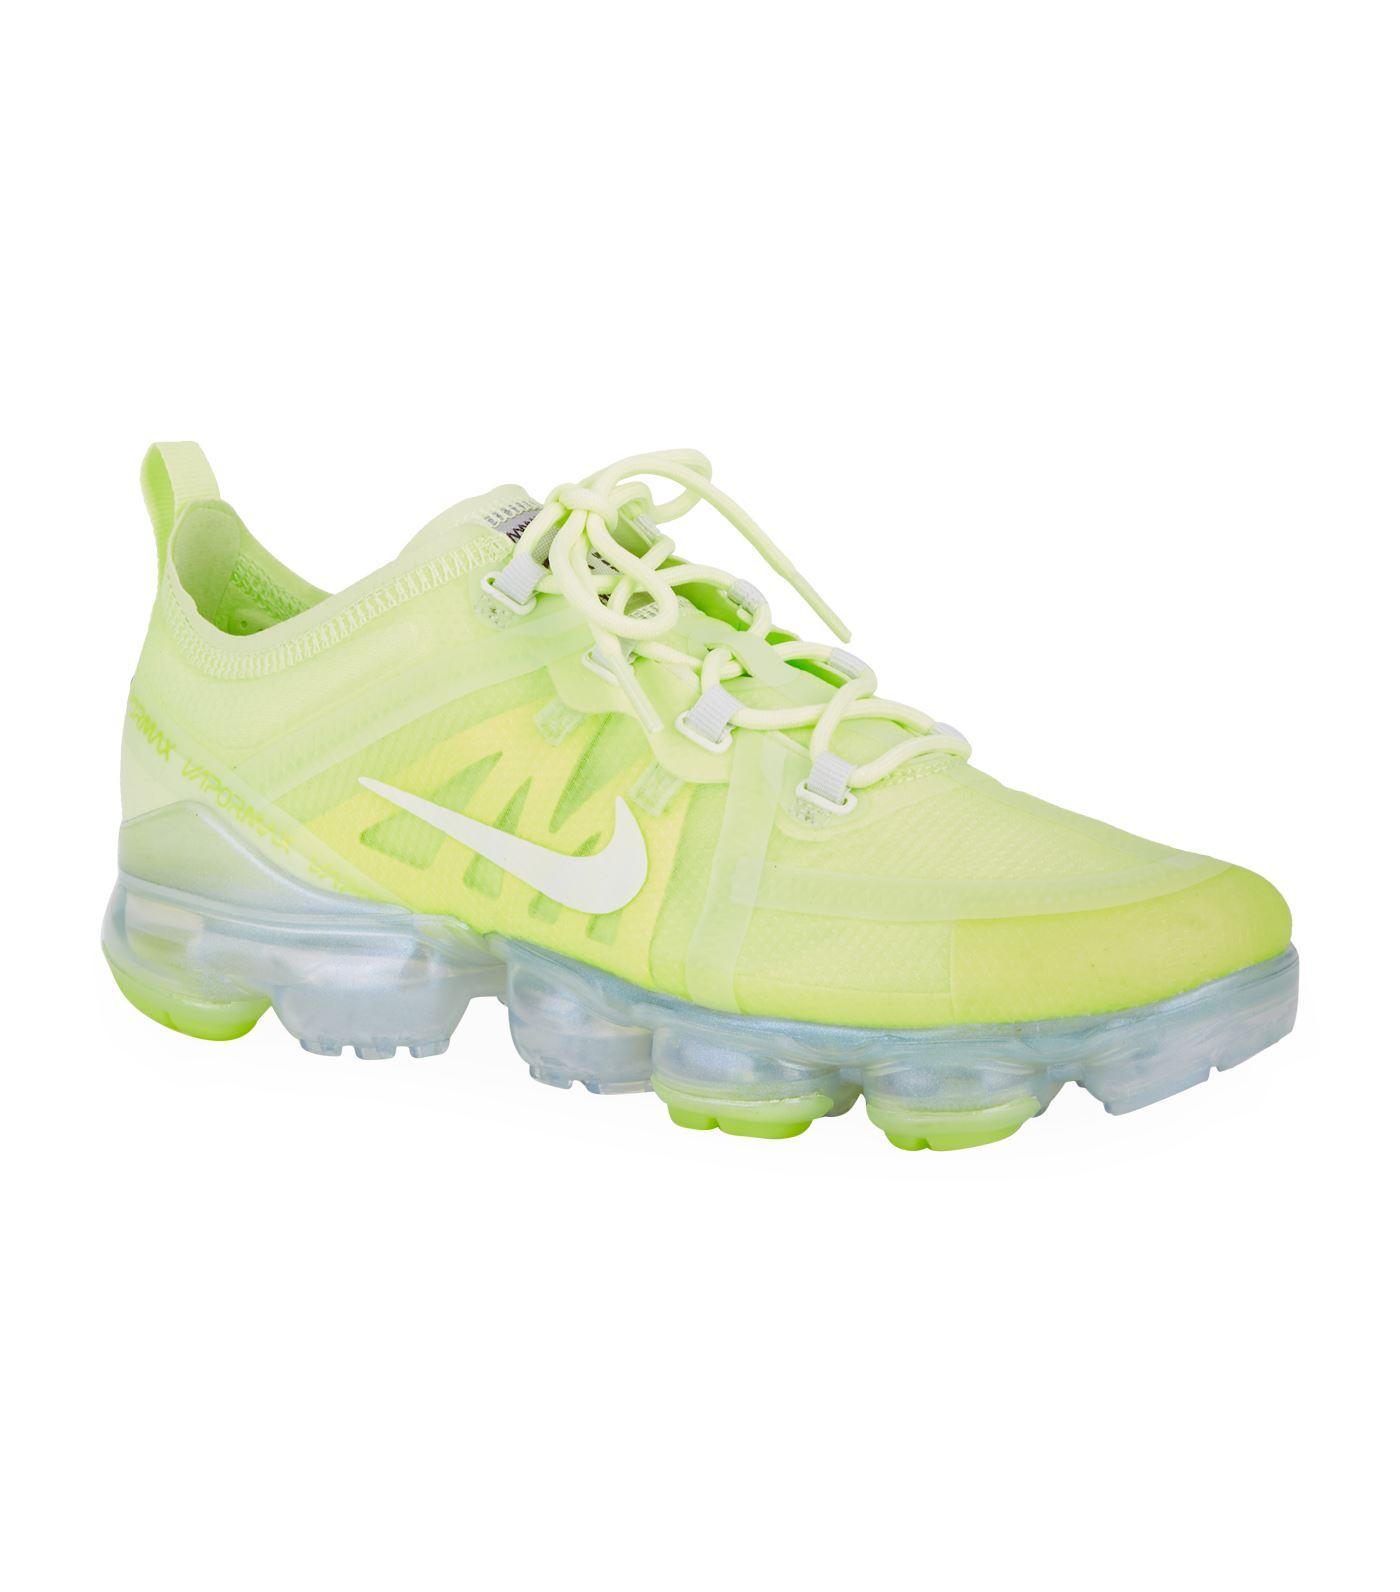 5cb0bd501feda Nike Yellow Air Vapormax 2019 Trainers